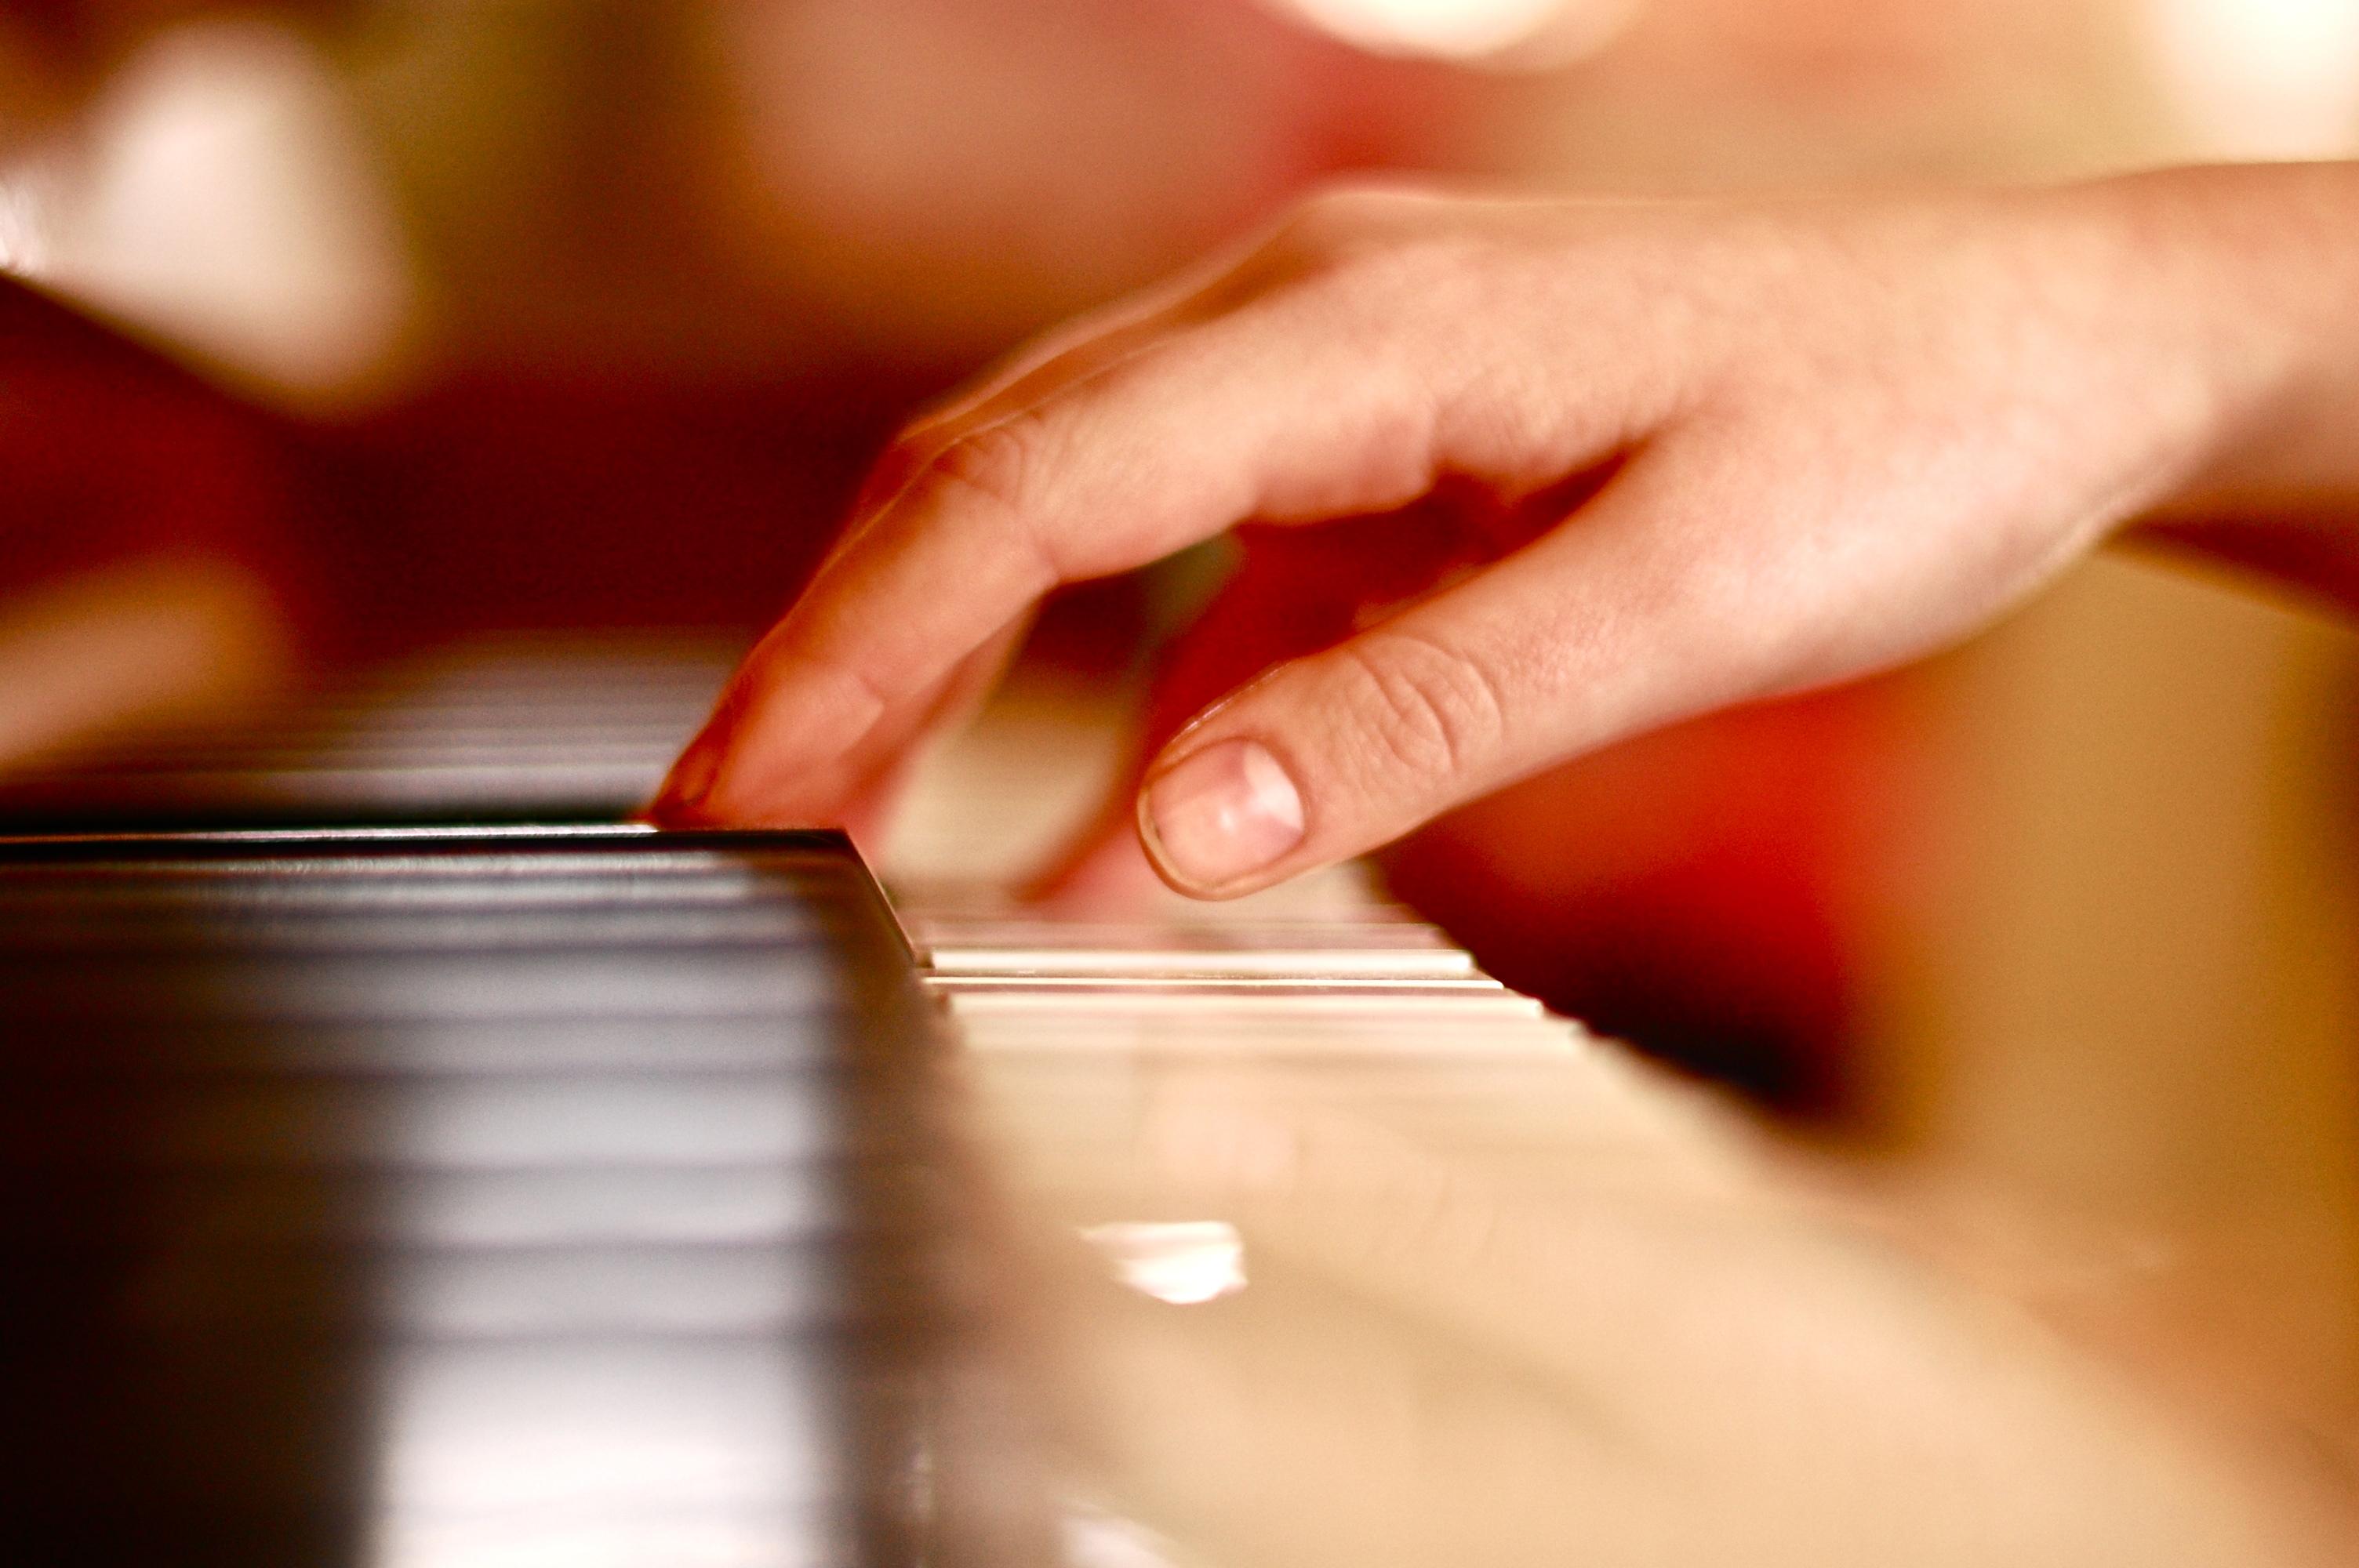 Wonderful Wallpaper Music Bright - light-music-playing-reflection-colors-keys-Nikon-hand-bright-bokeh-song-fingers-piano-musical-pianokeys-d40-pianoplayers-937529  HD_59670.jpg